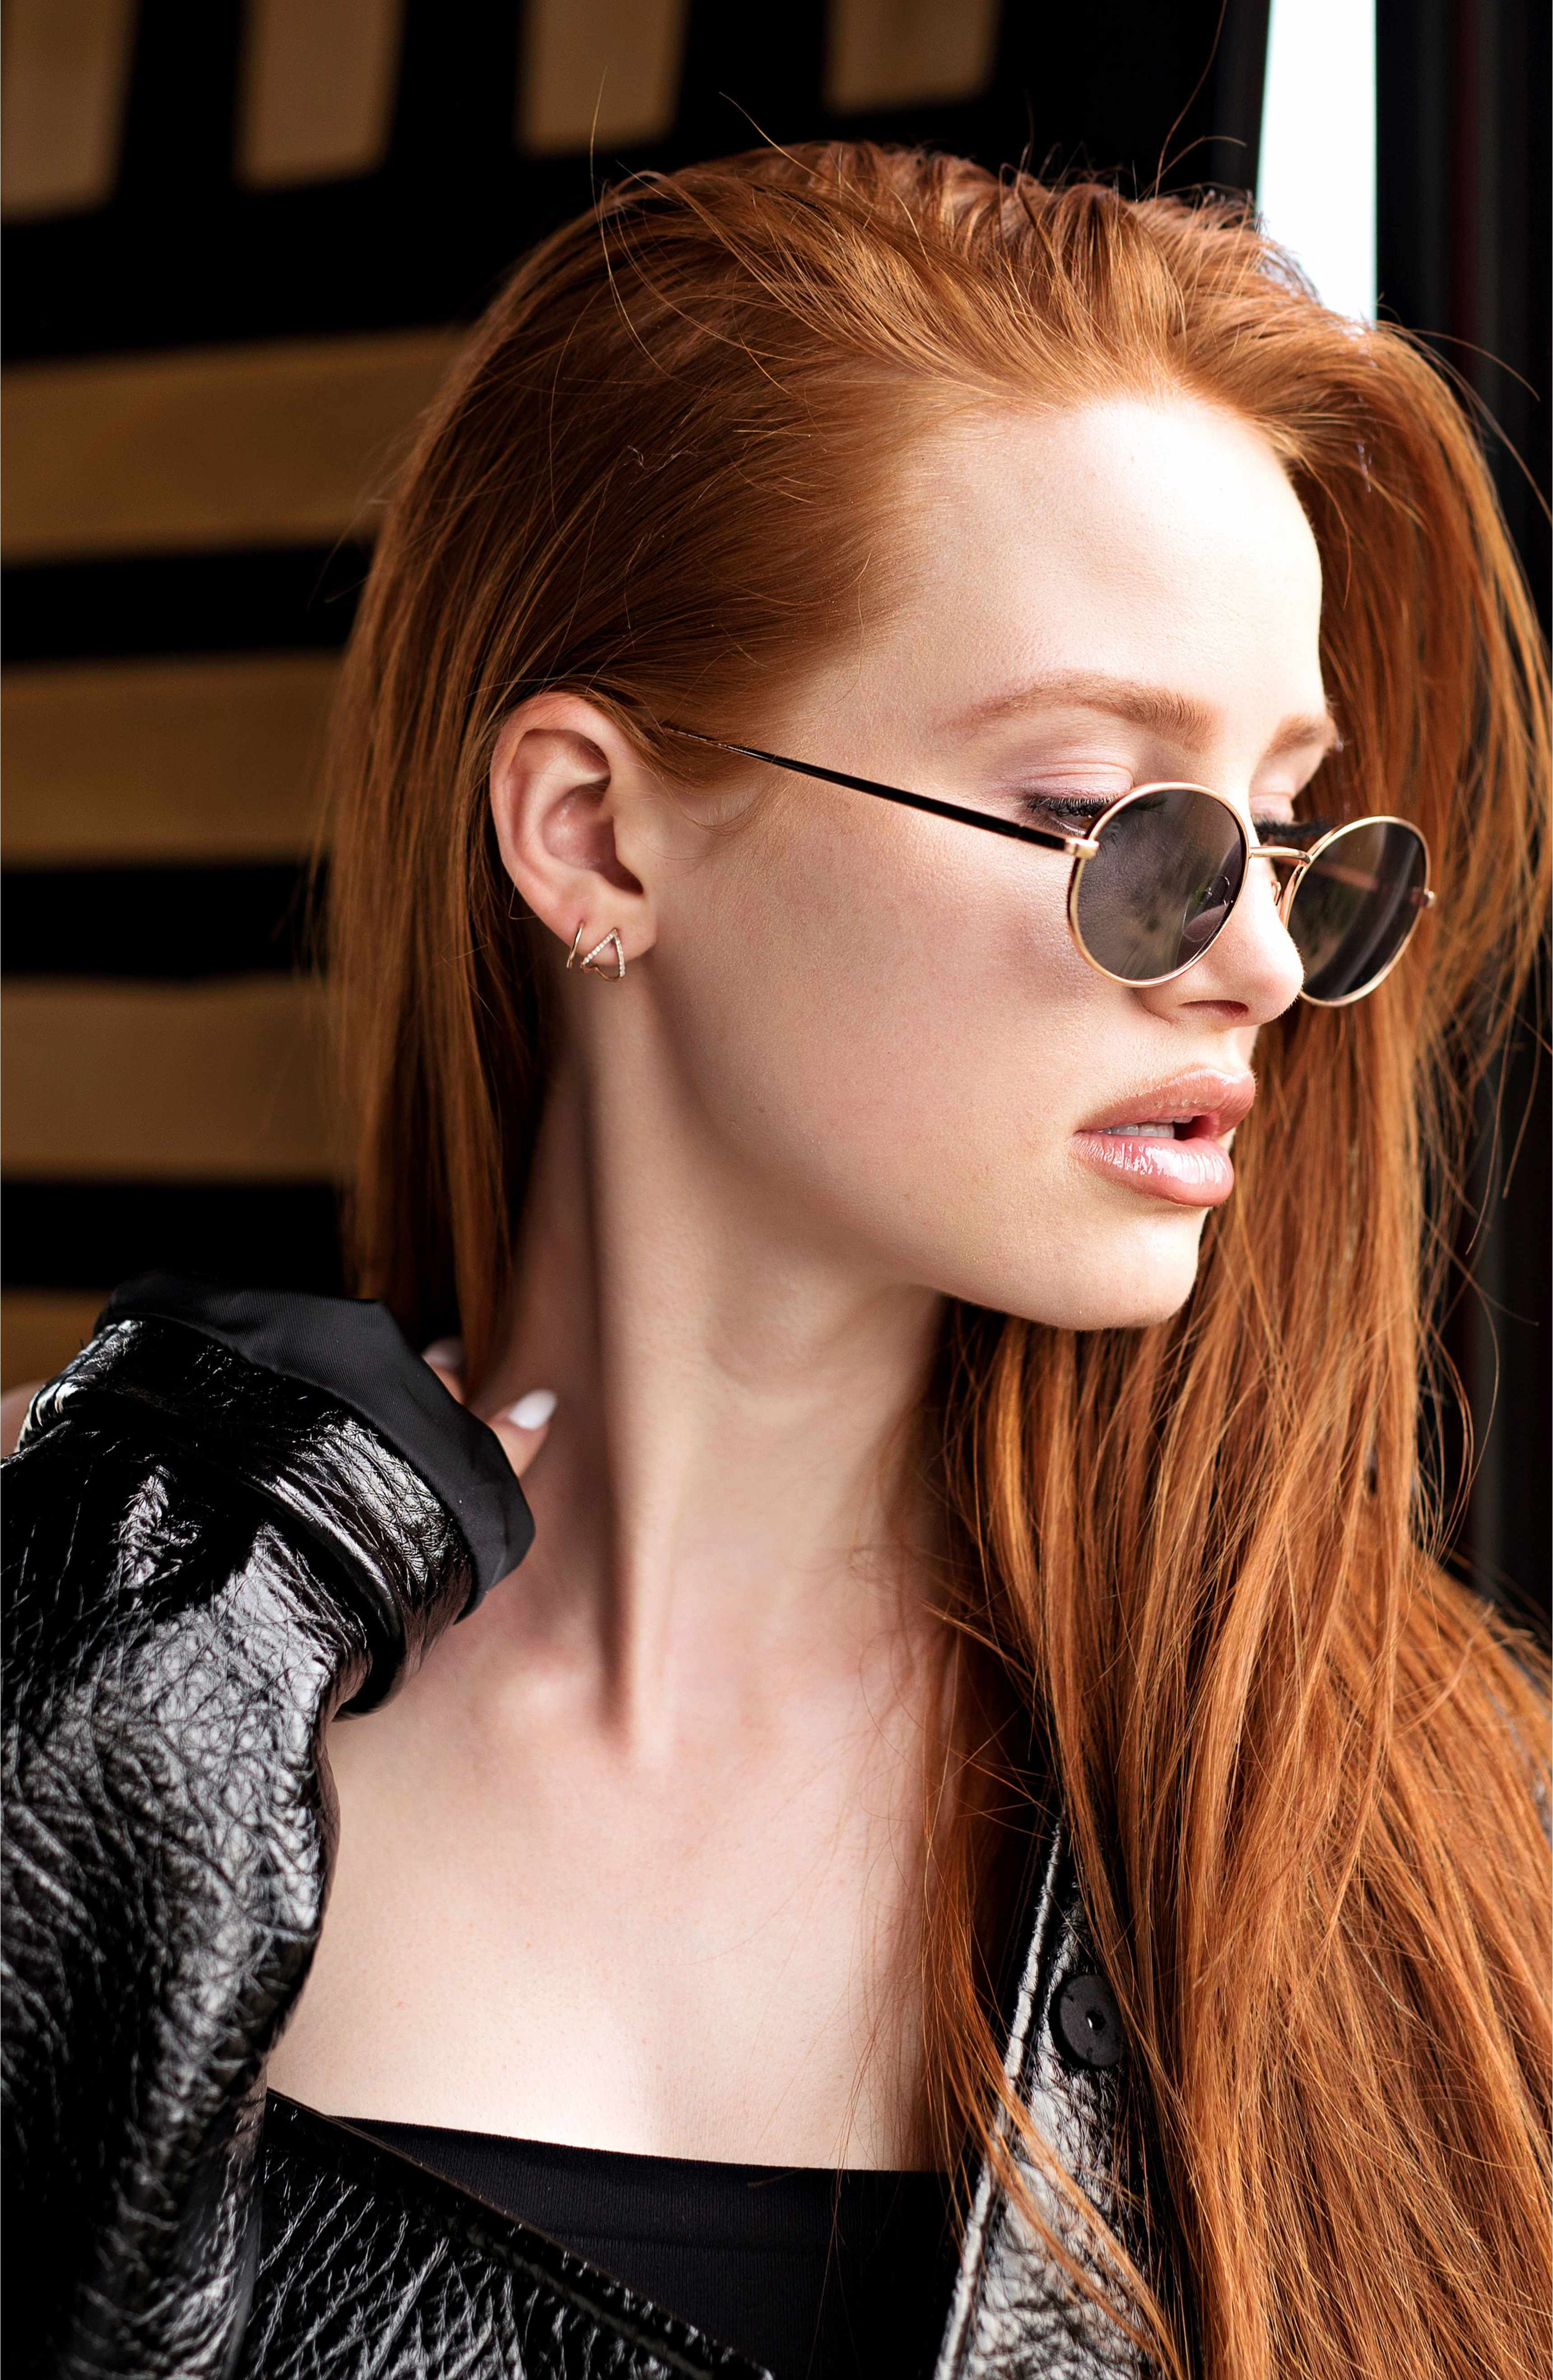 08511c7d8d Main Image - Privé Revaux x Madelaine Petsch The Candy 50mm Round Sunglasses